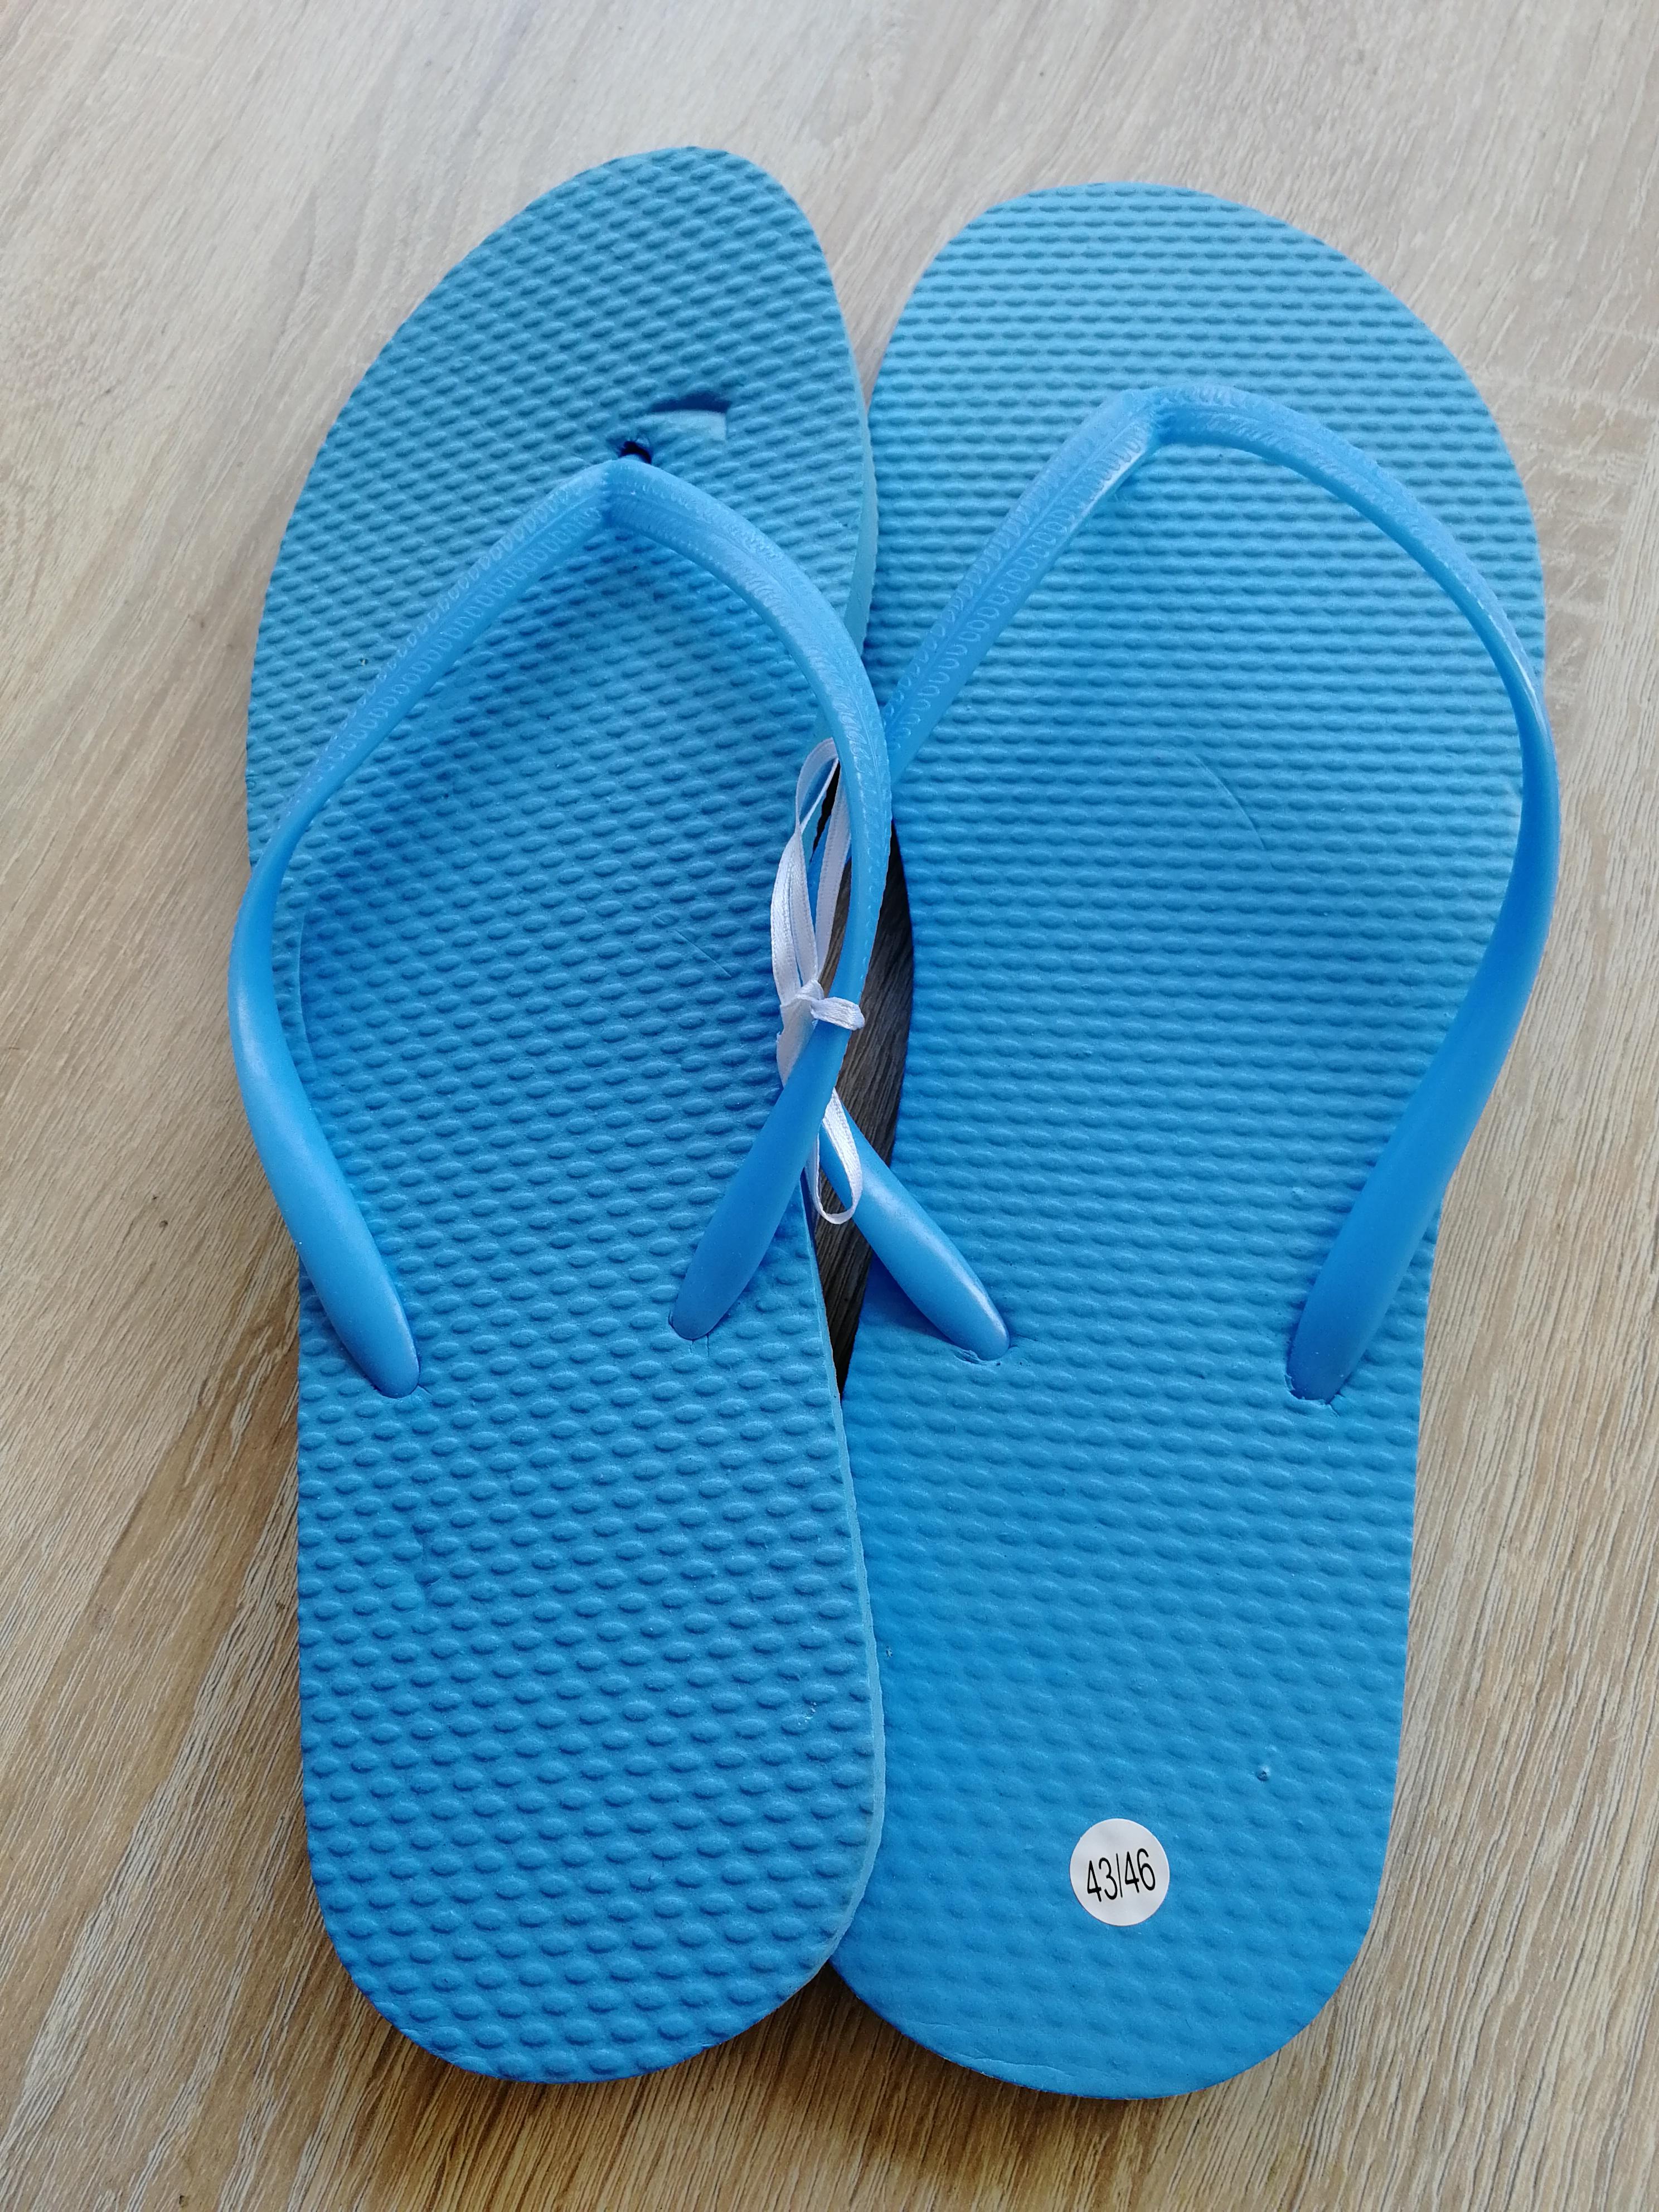 Blaue Flipflops Gr. 43/46 NEU tauschen